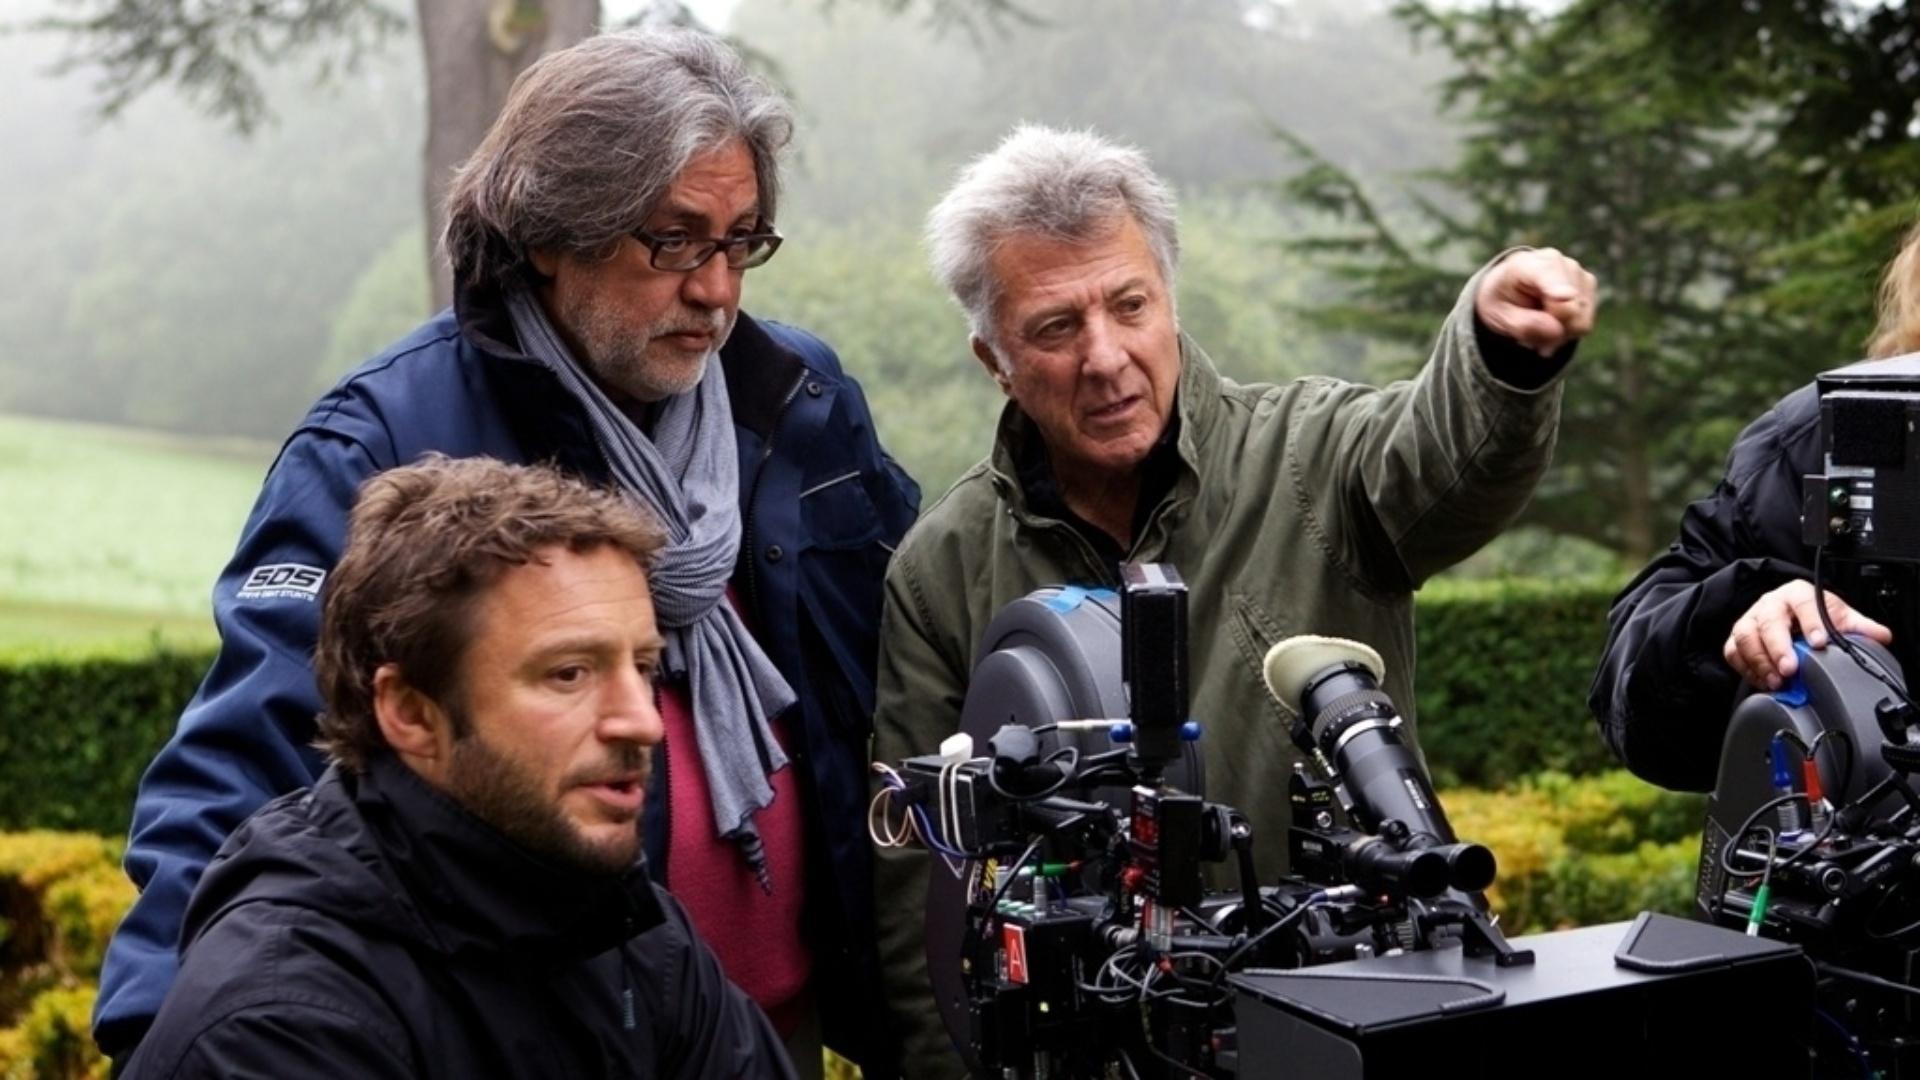 Dustin Hoffman passa instruções durante as filmagens de